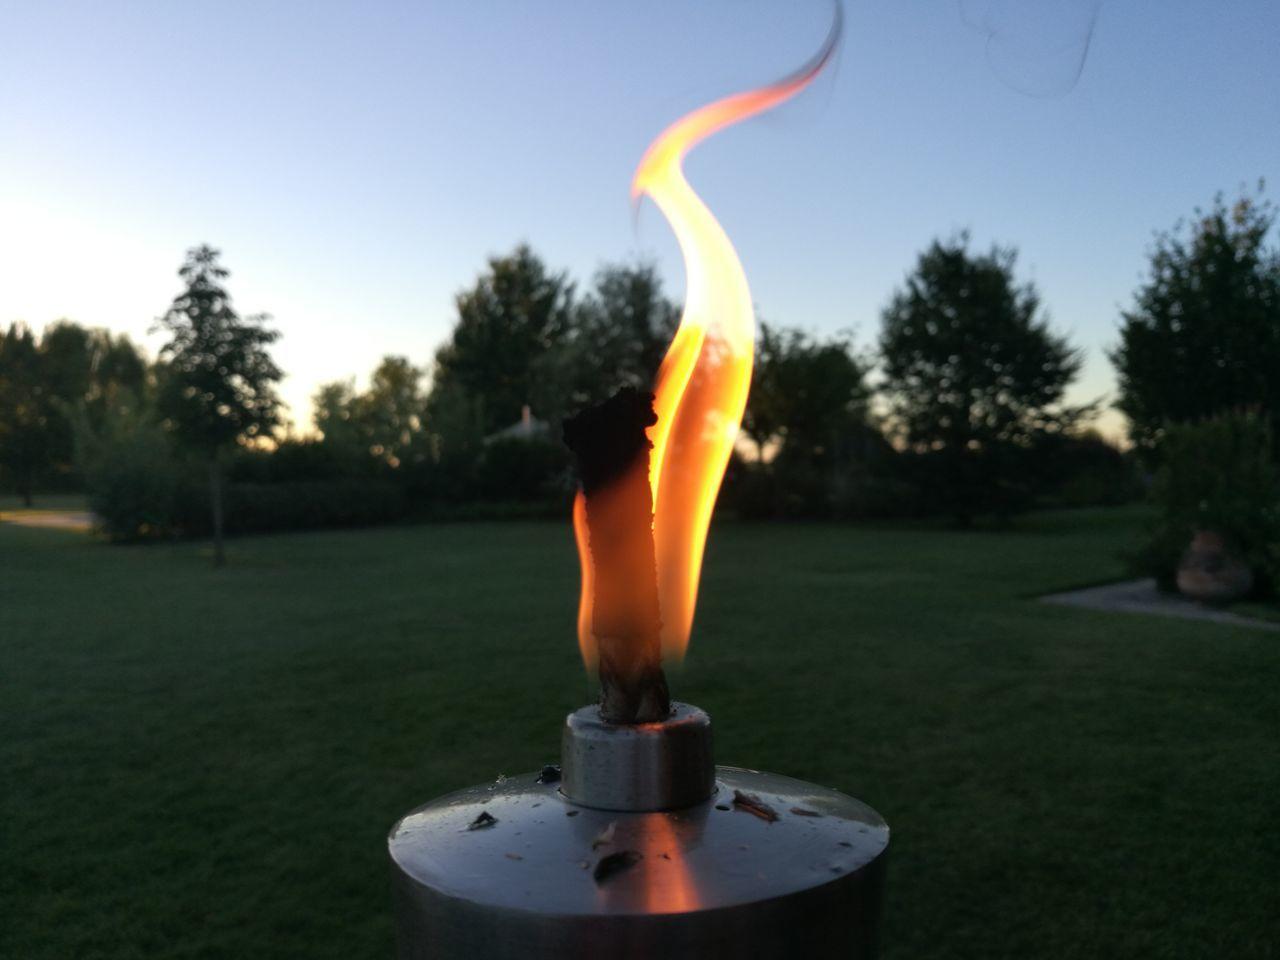 Beautiful stock photos of feuerwerk, burning, heat - temperature, flame, close-up